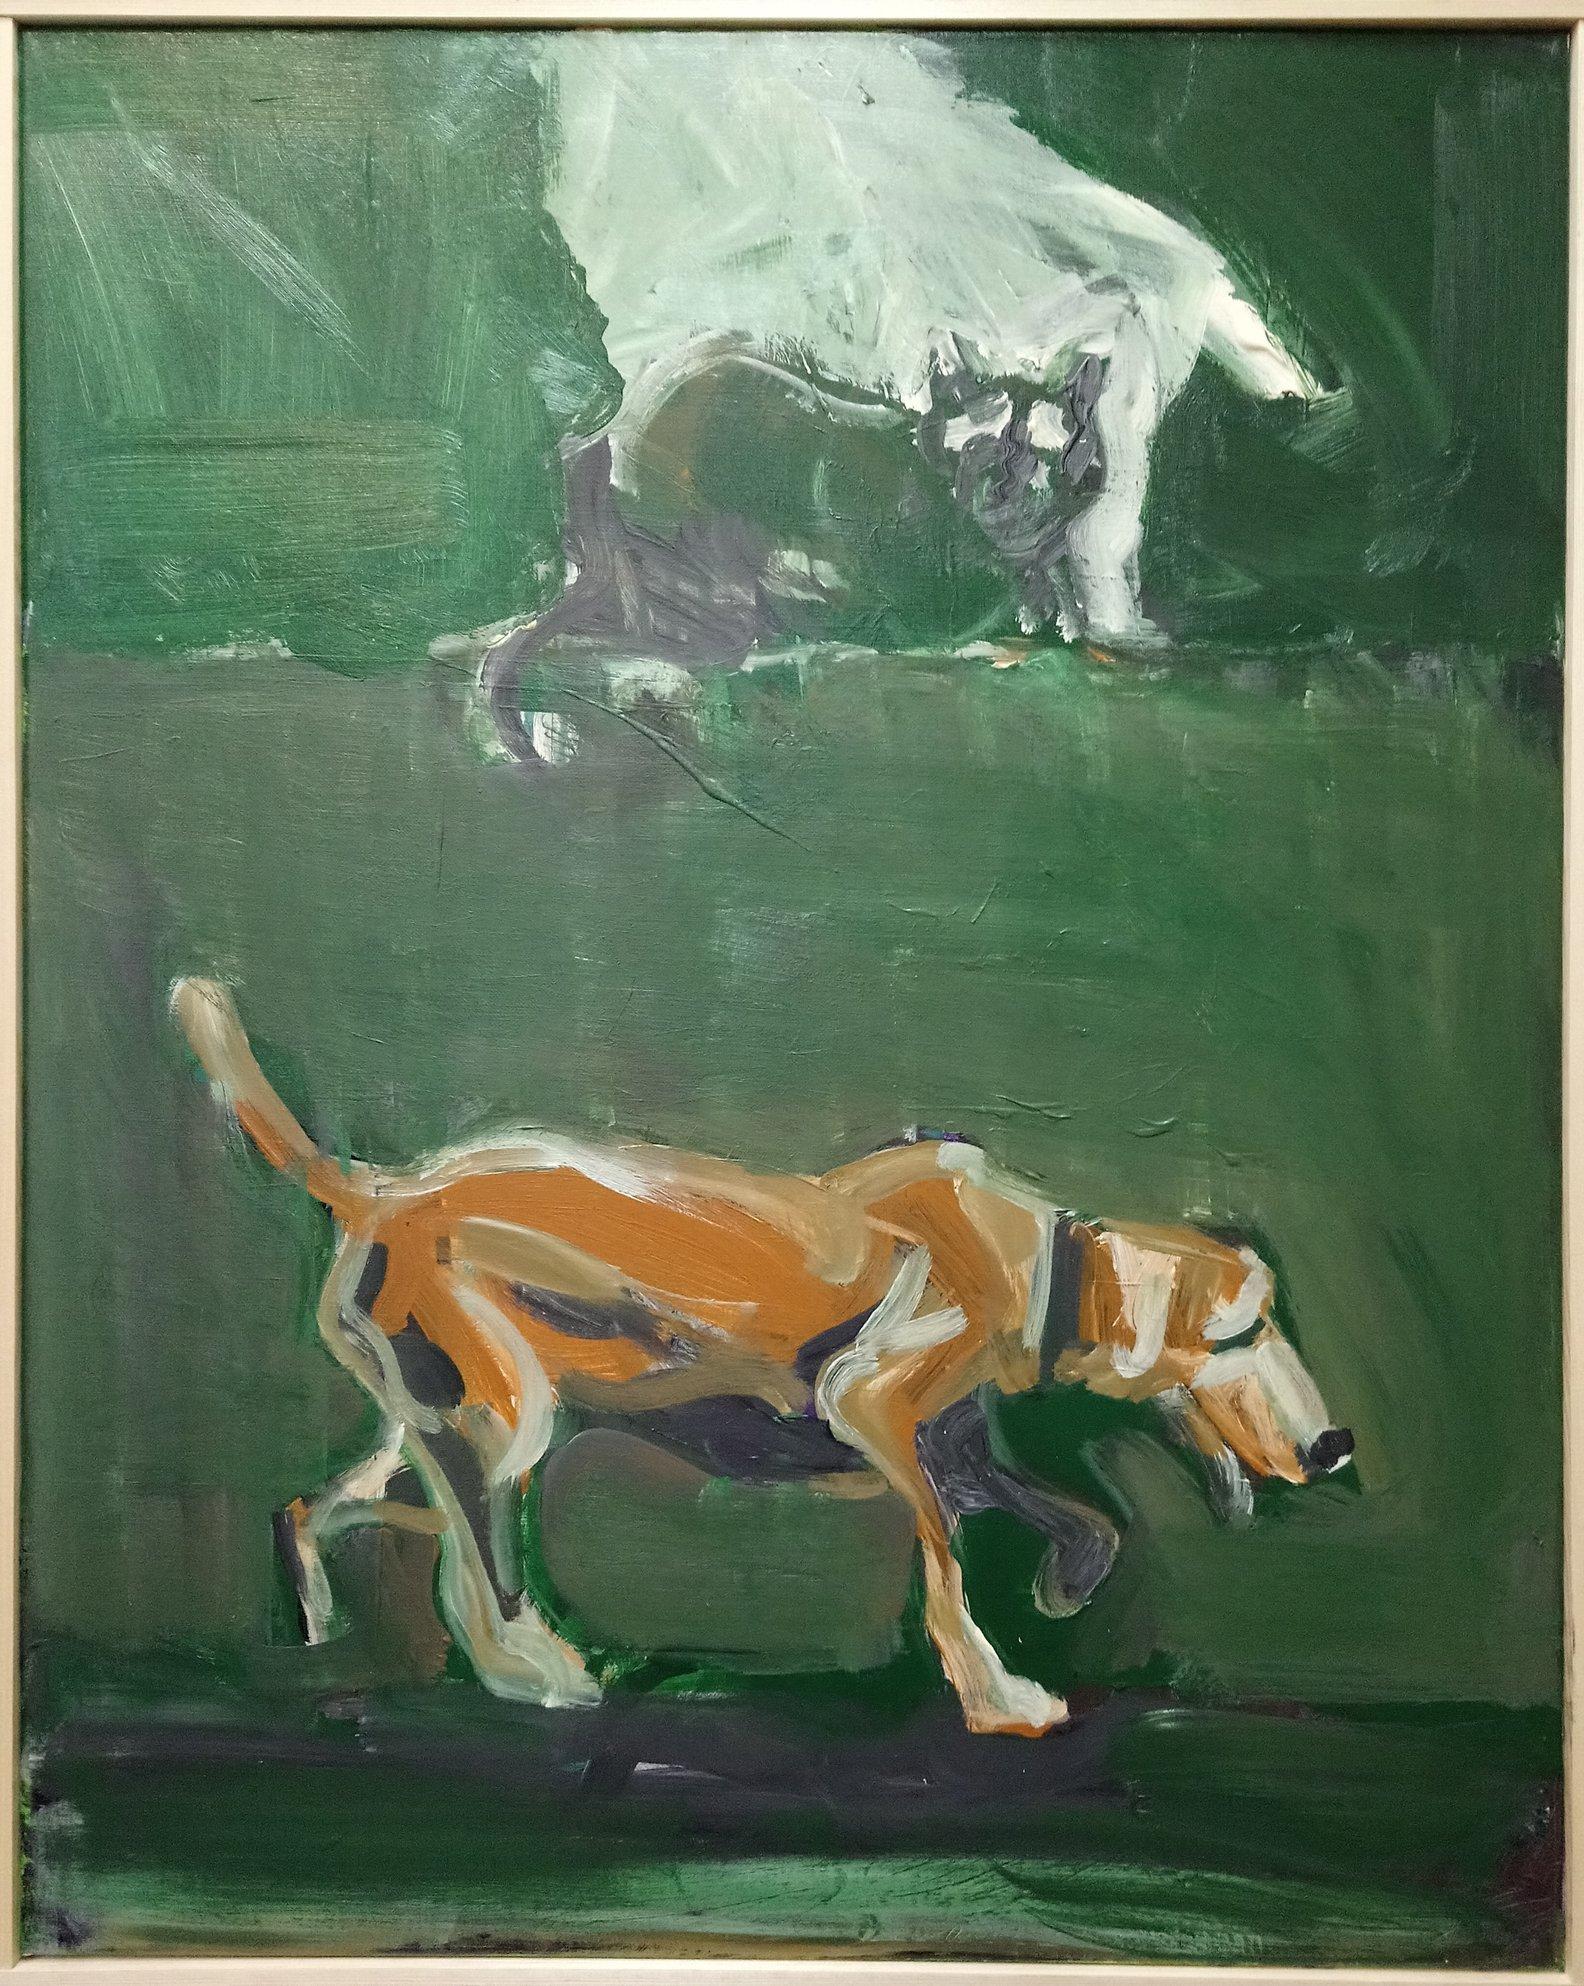 Pies i kot 100x80 olej płótno 2019